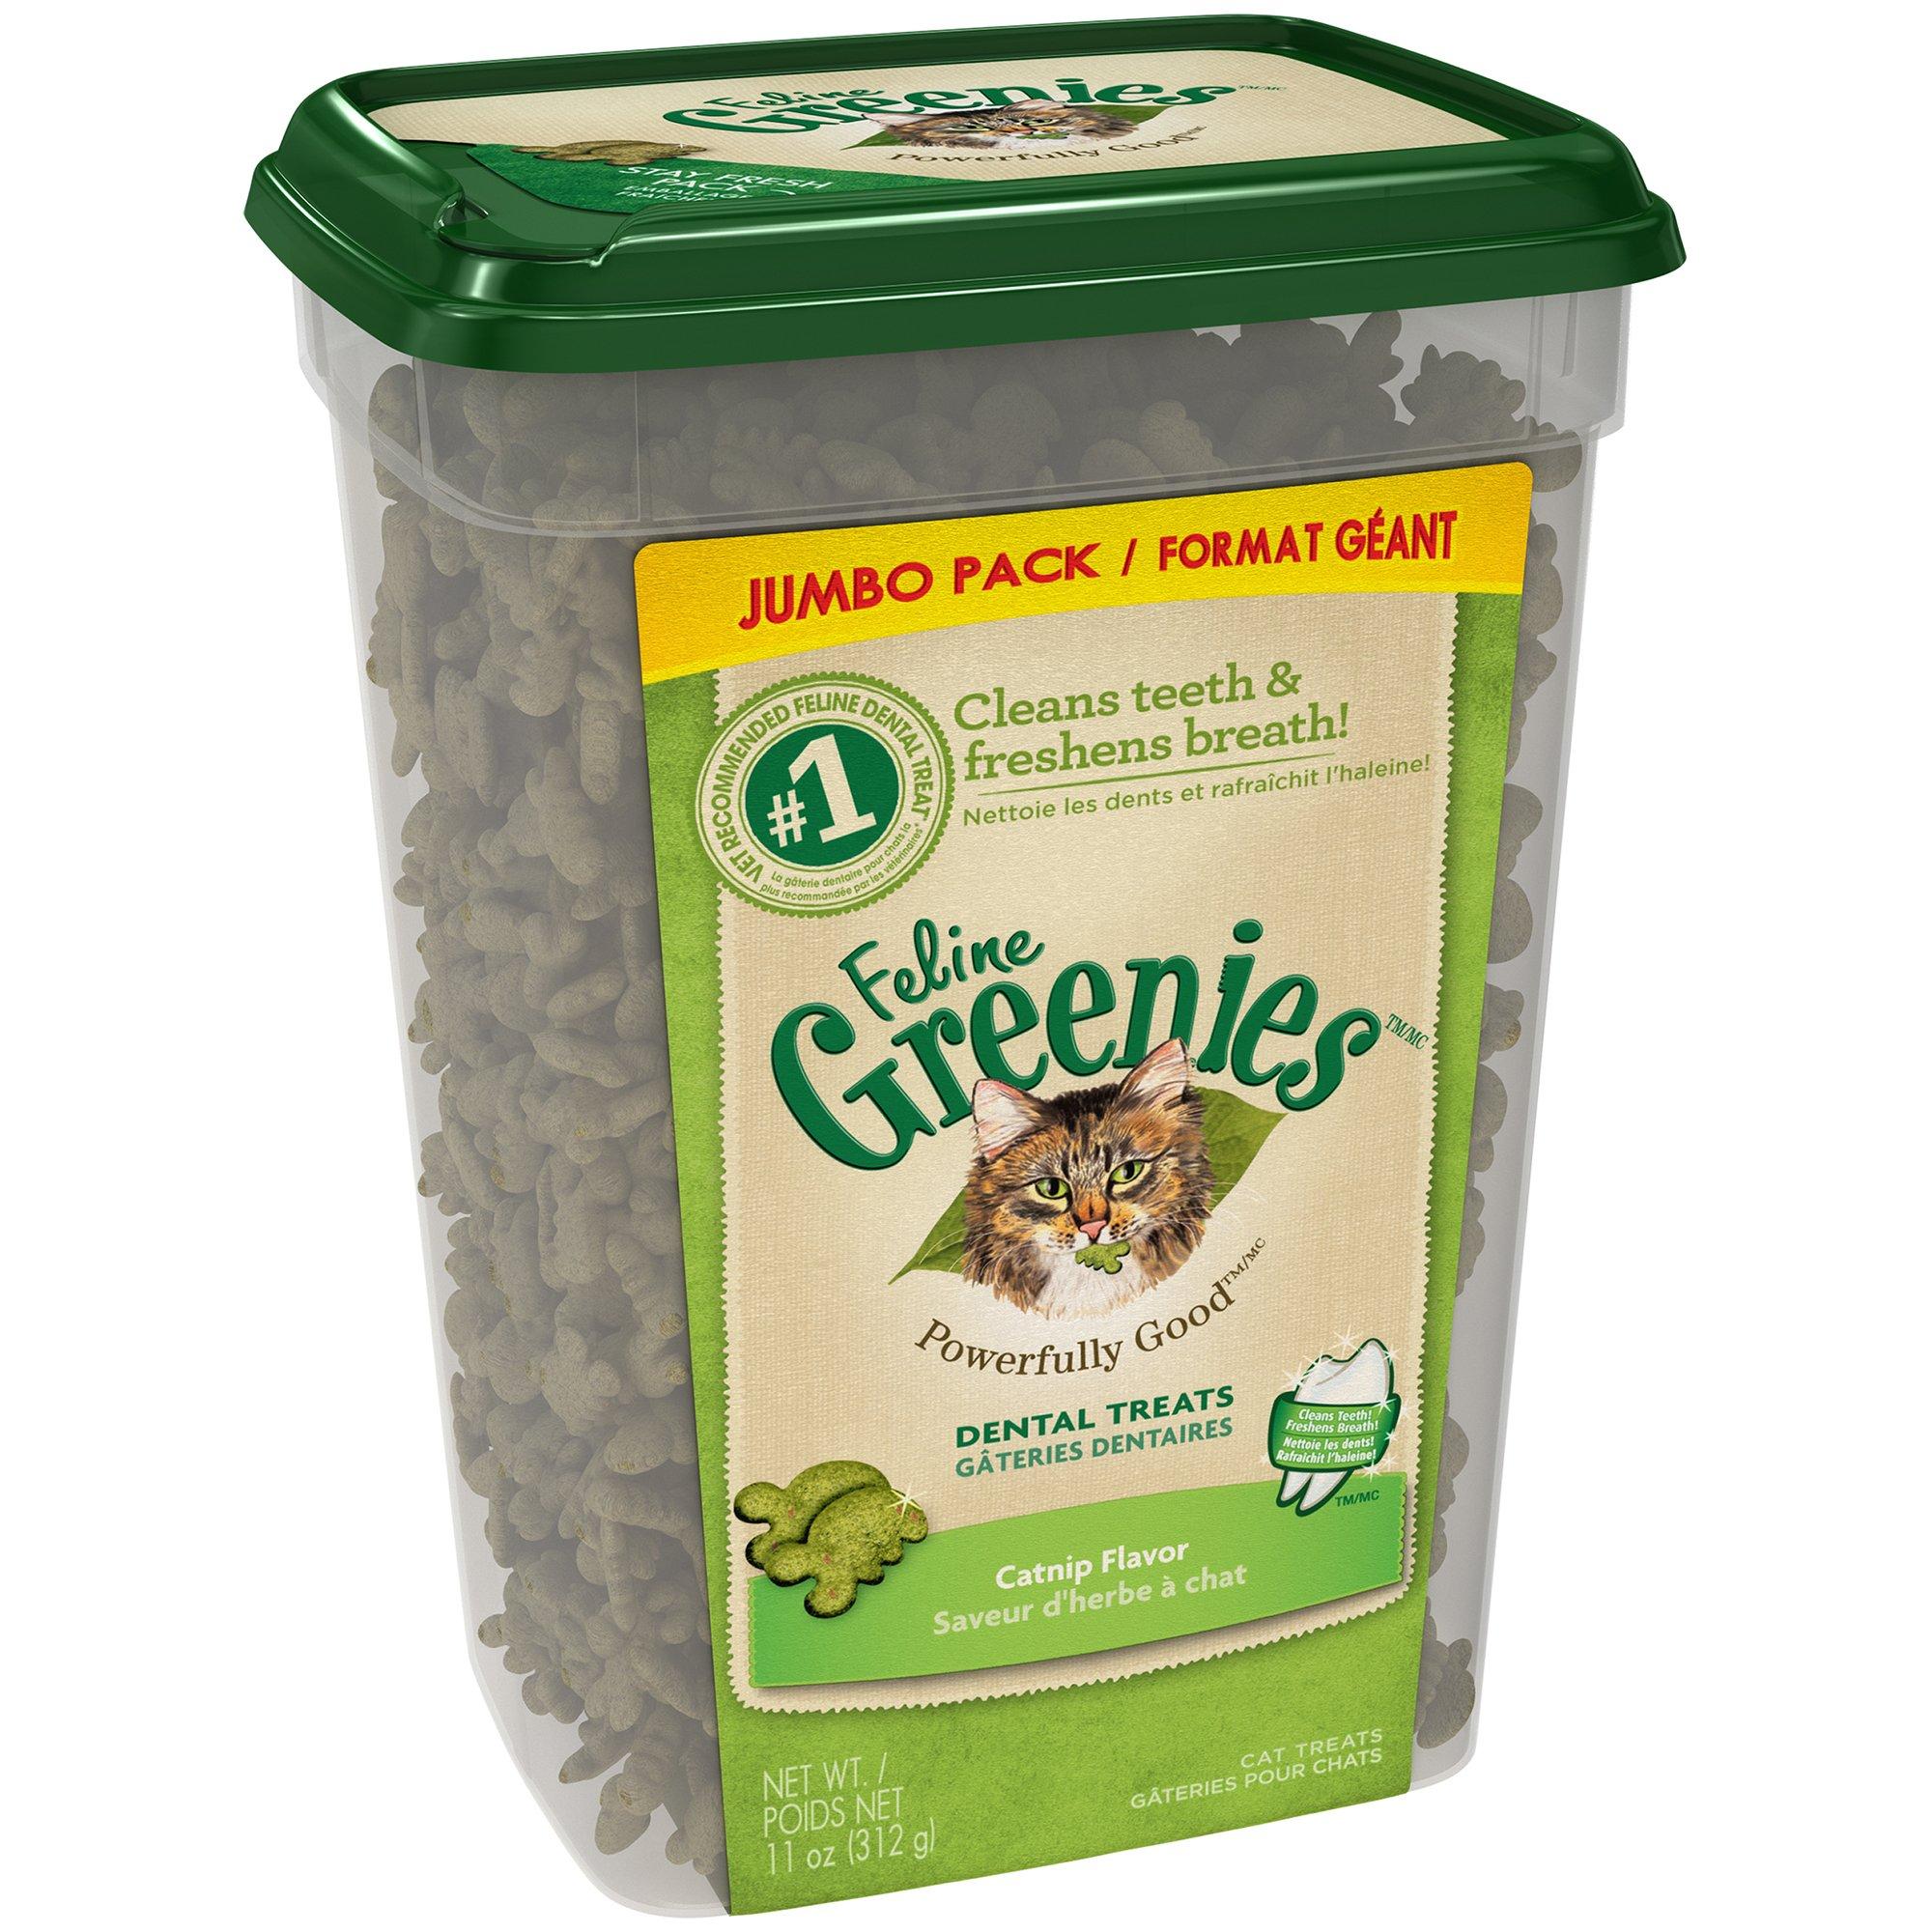 Greenies Feline Dental Treats for Cats Catnip Flavor 11 oz.